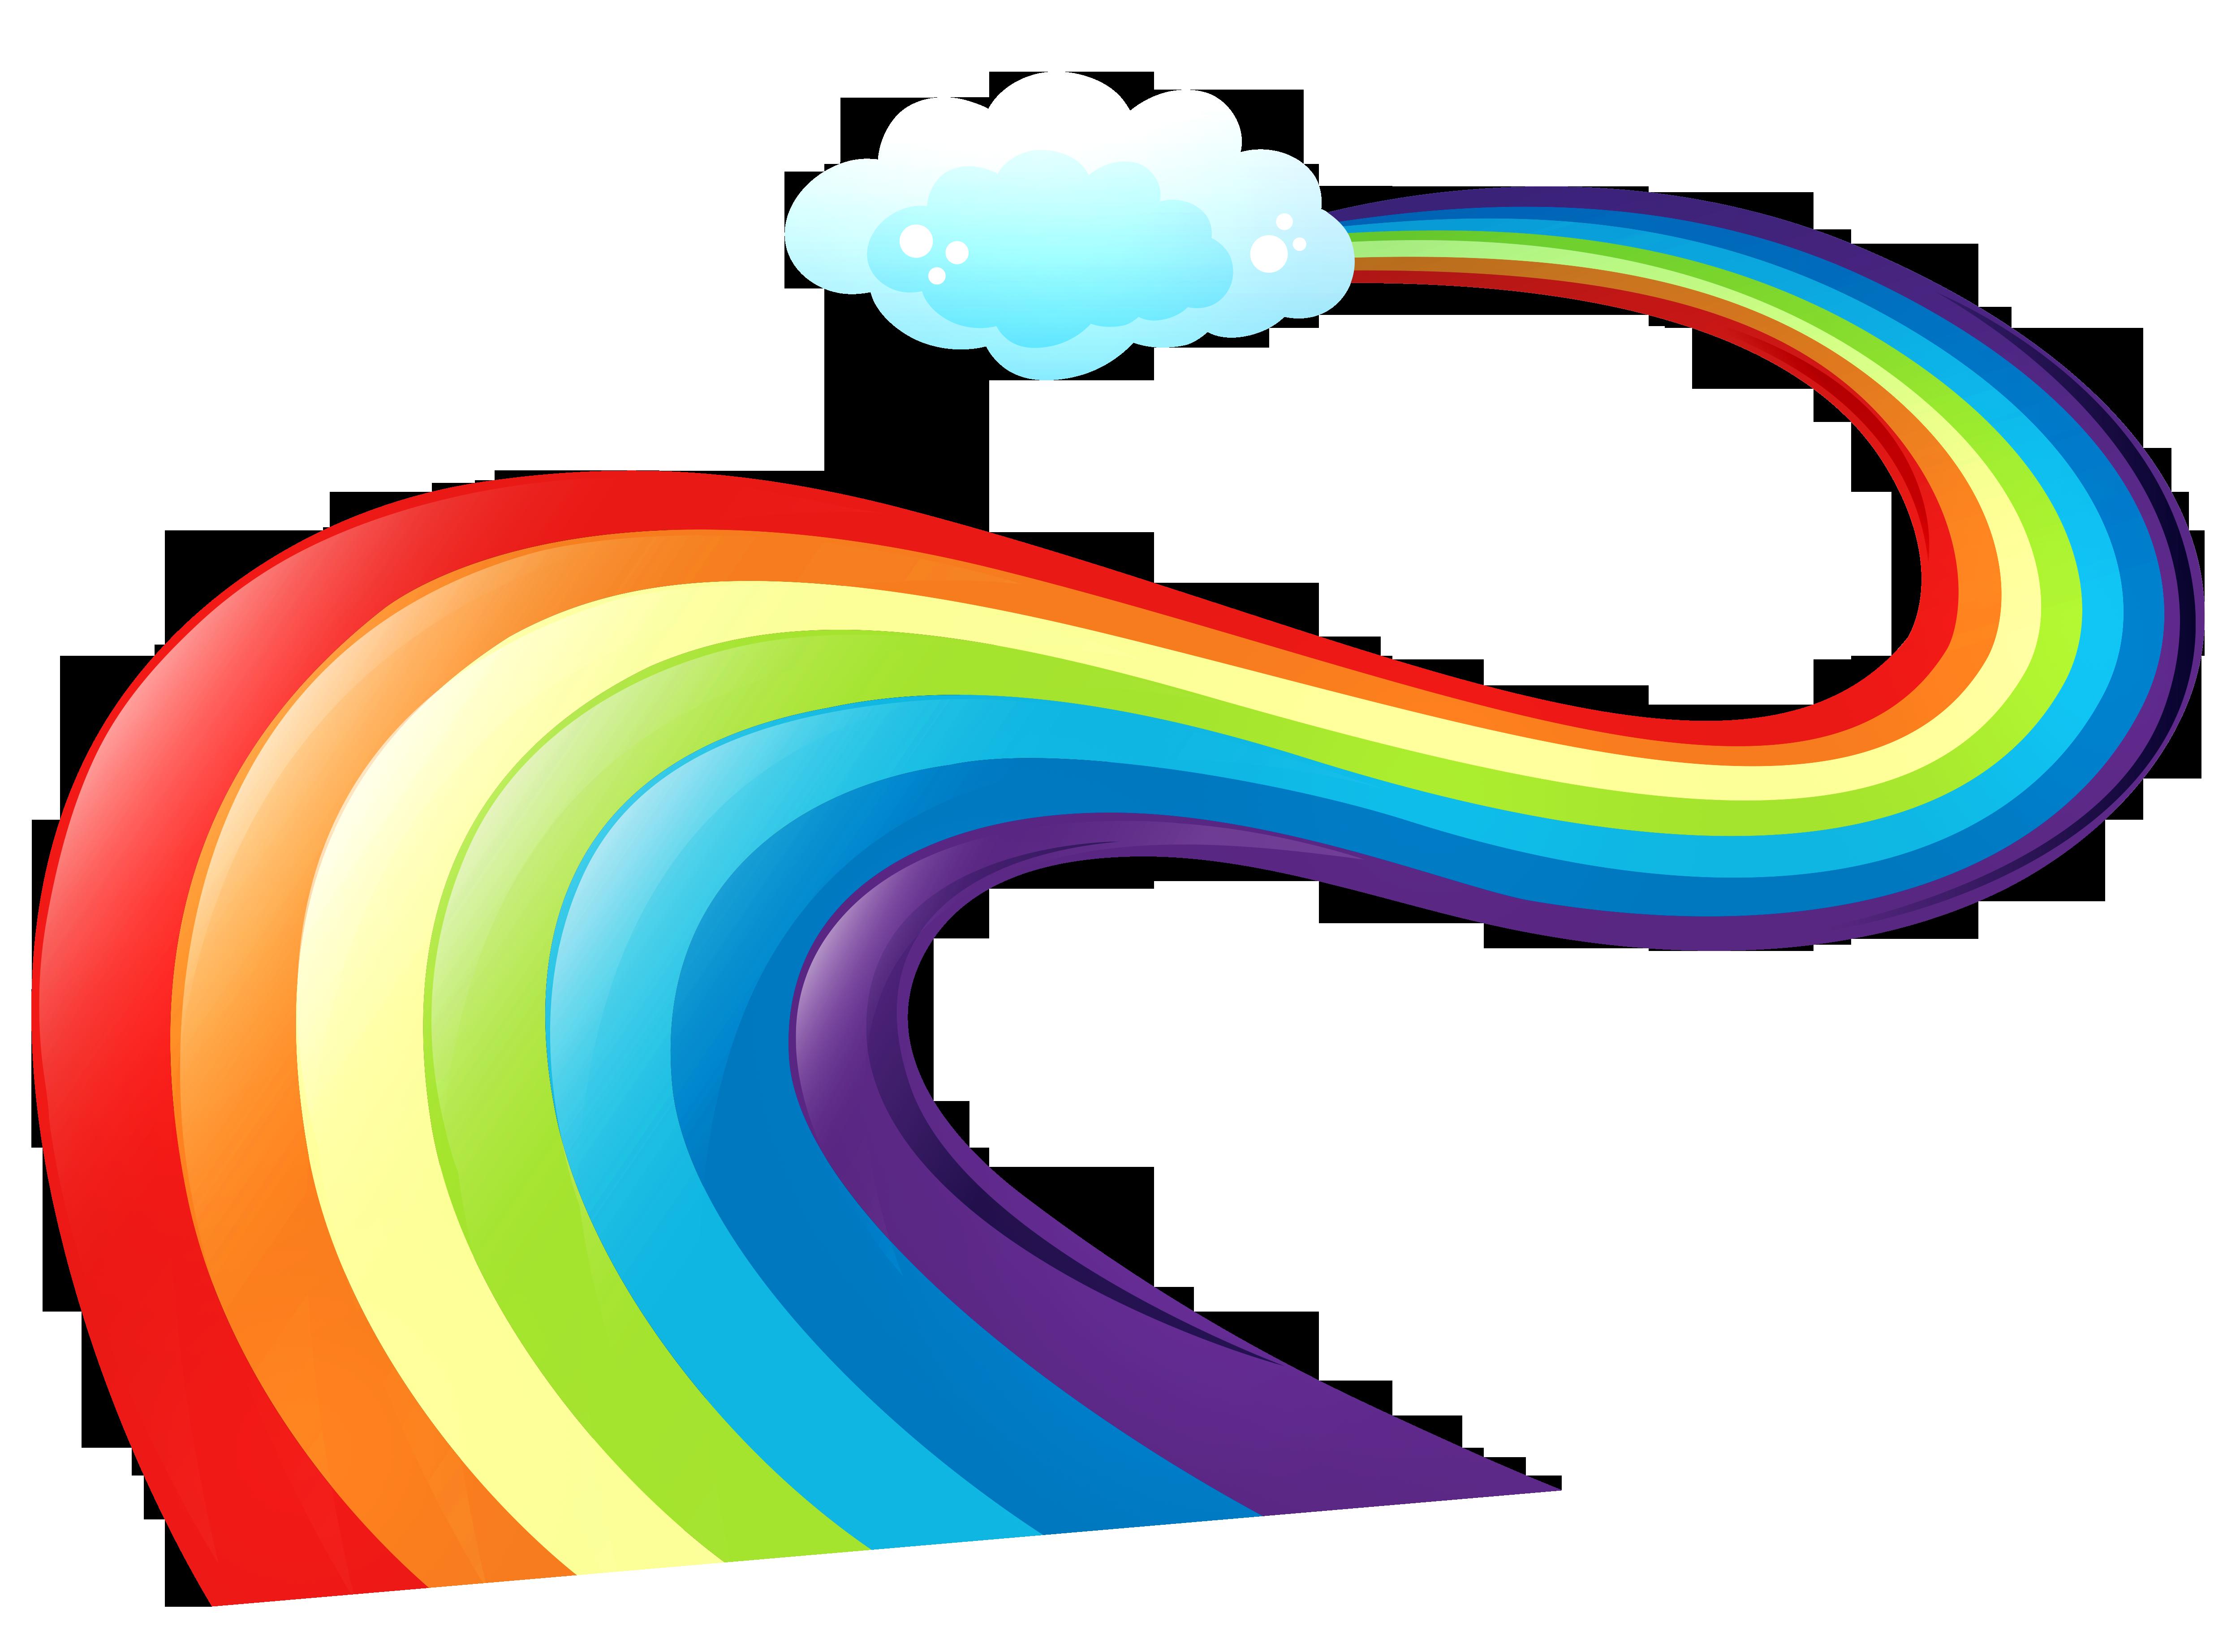 rainbow clipart clip way rainbows cartoon cliparts background vector road hd designs